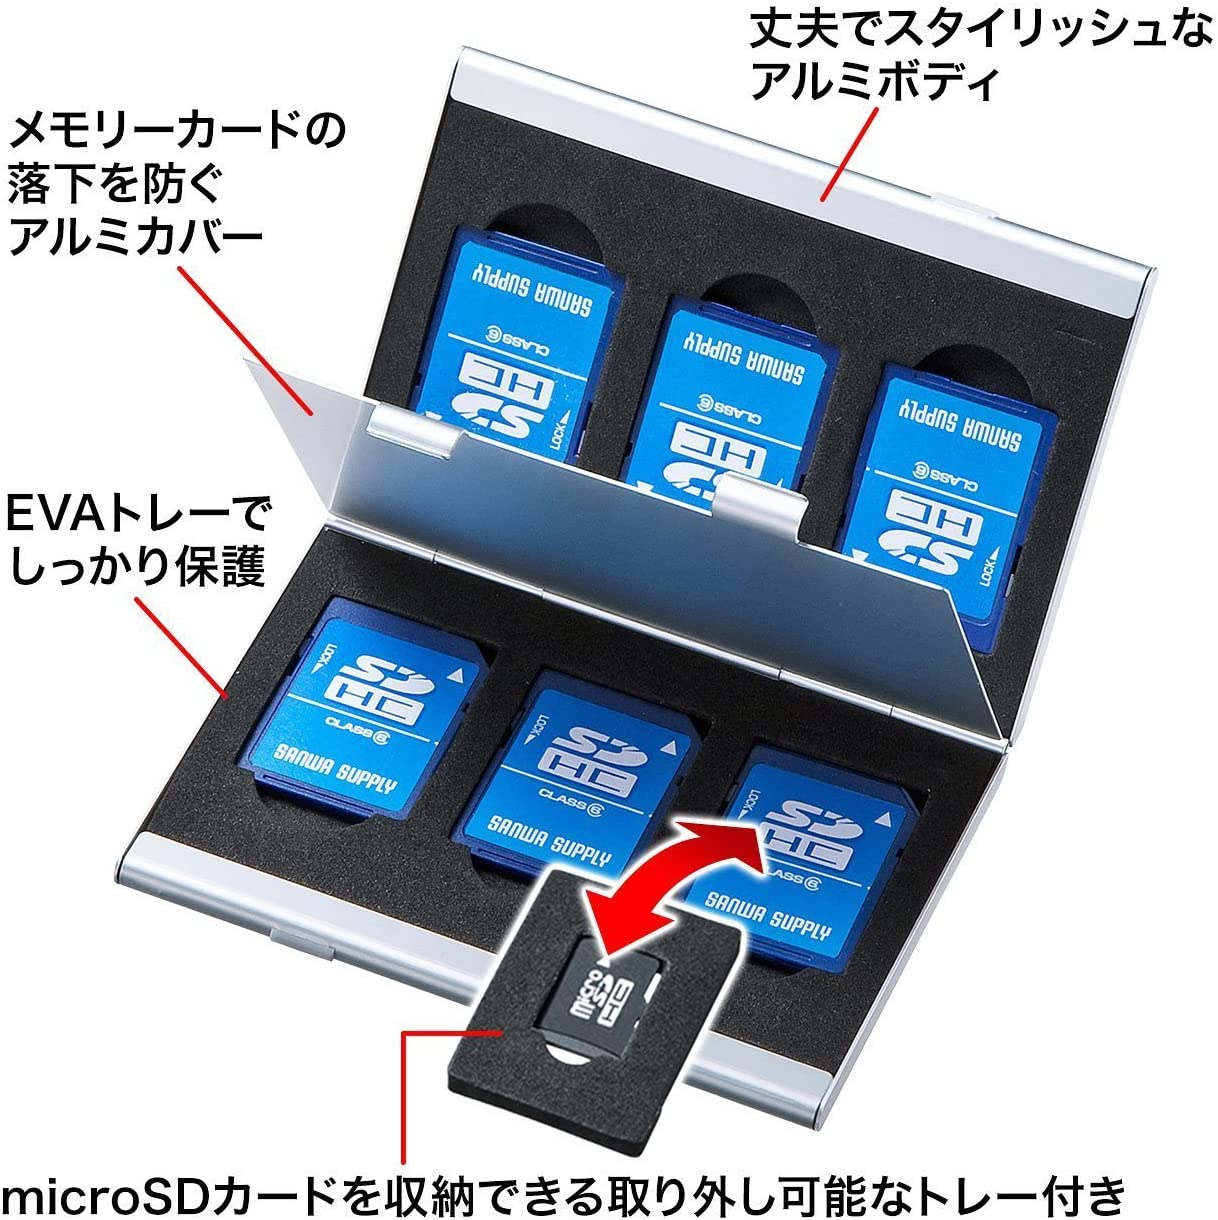 15 en 1 Tarjeta de memoria Flash de Aluminio Soporte Caja de almacenamiento caso para TF SD Micro Sim